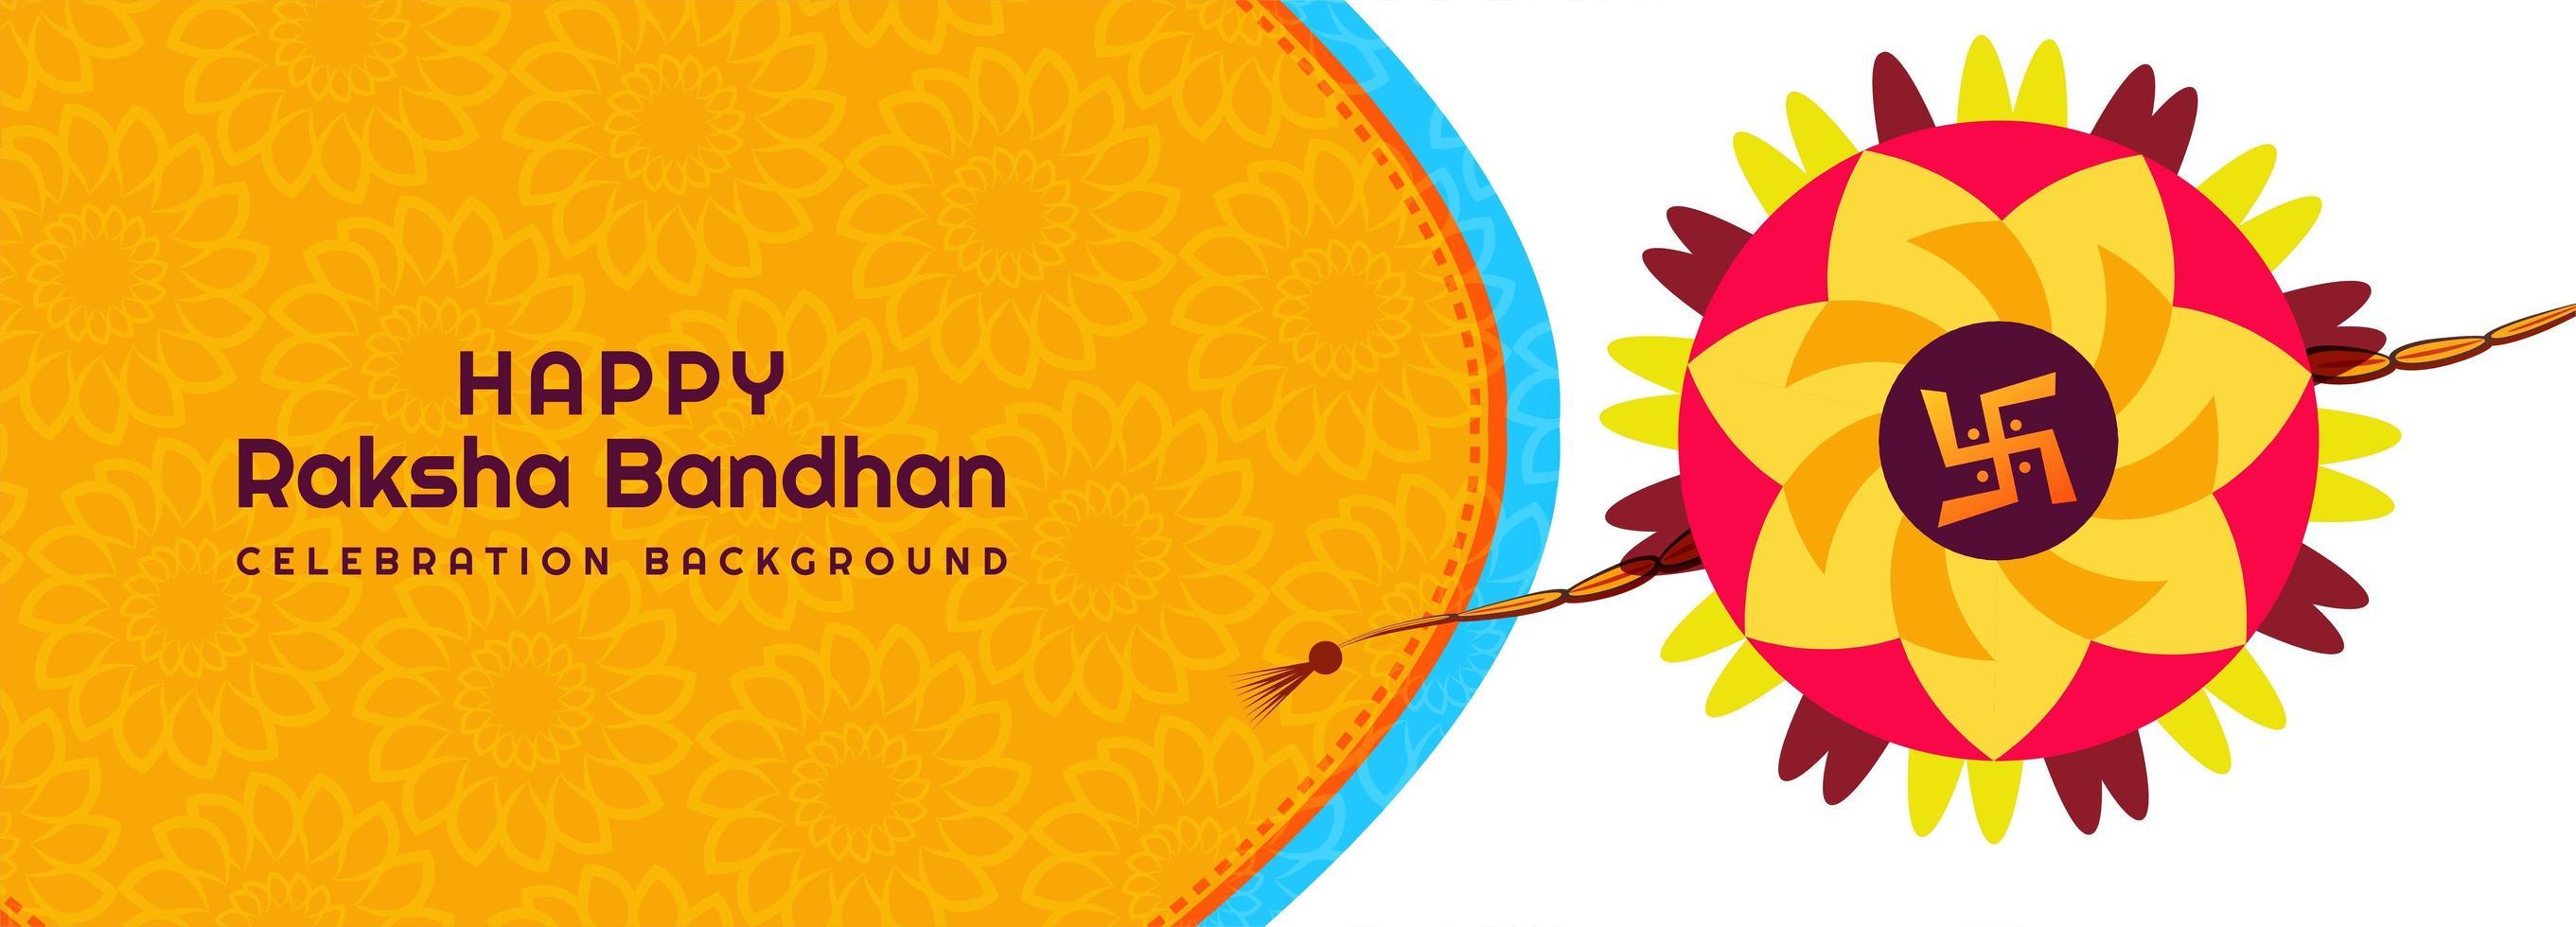 gelukkige raksha bandhan festival banner achtergrond vector